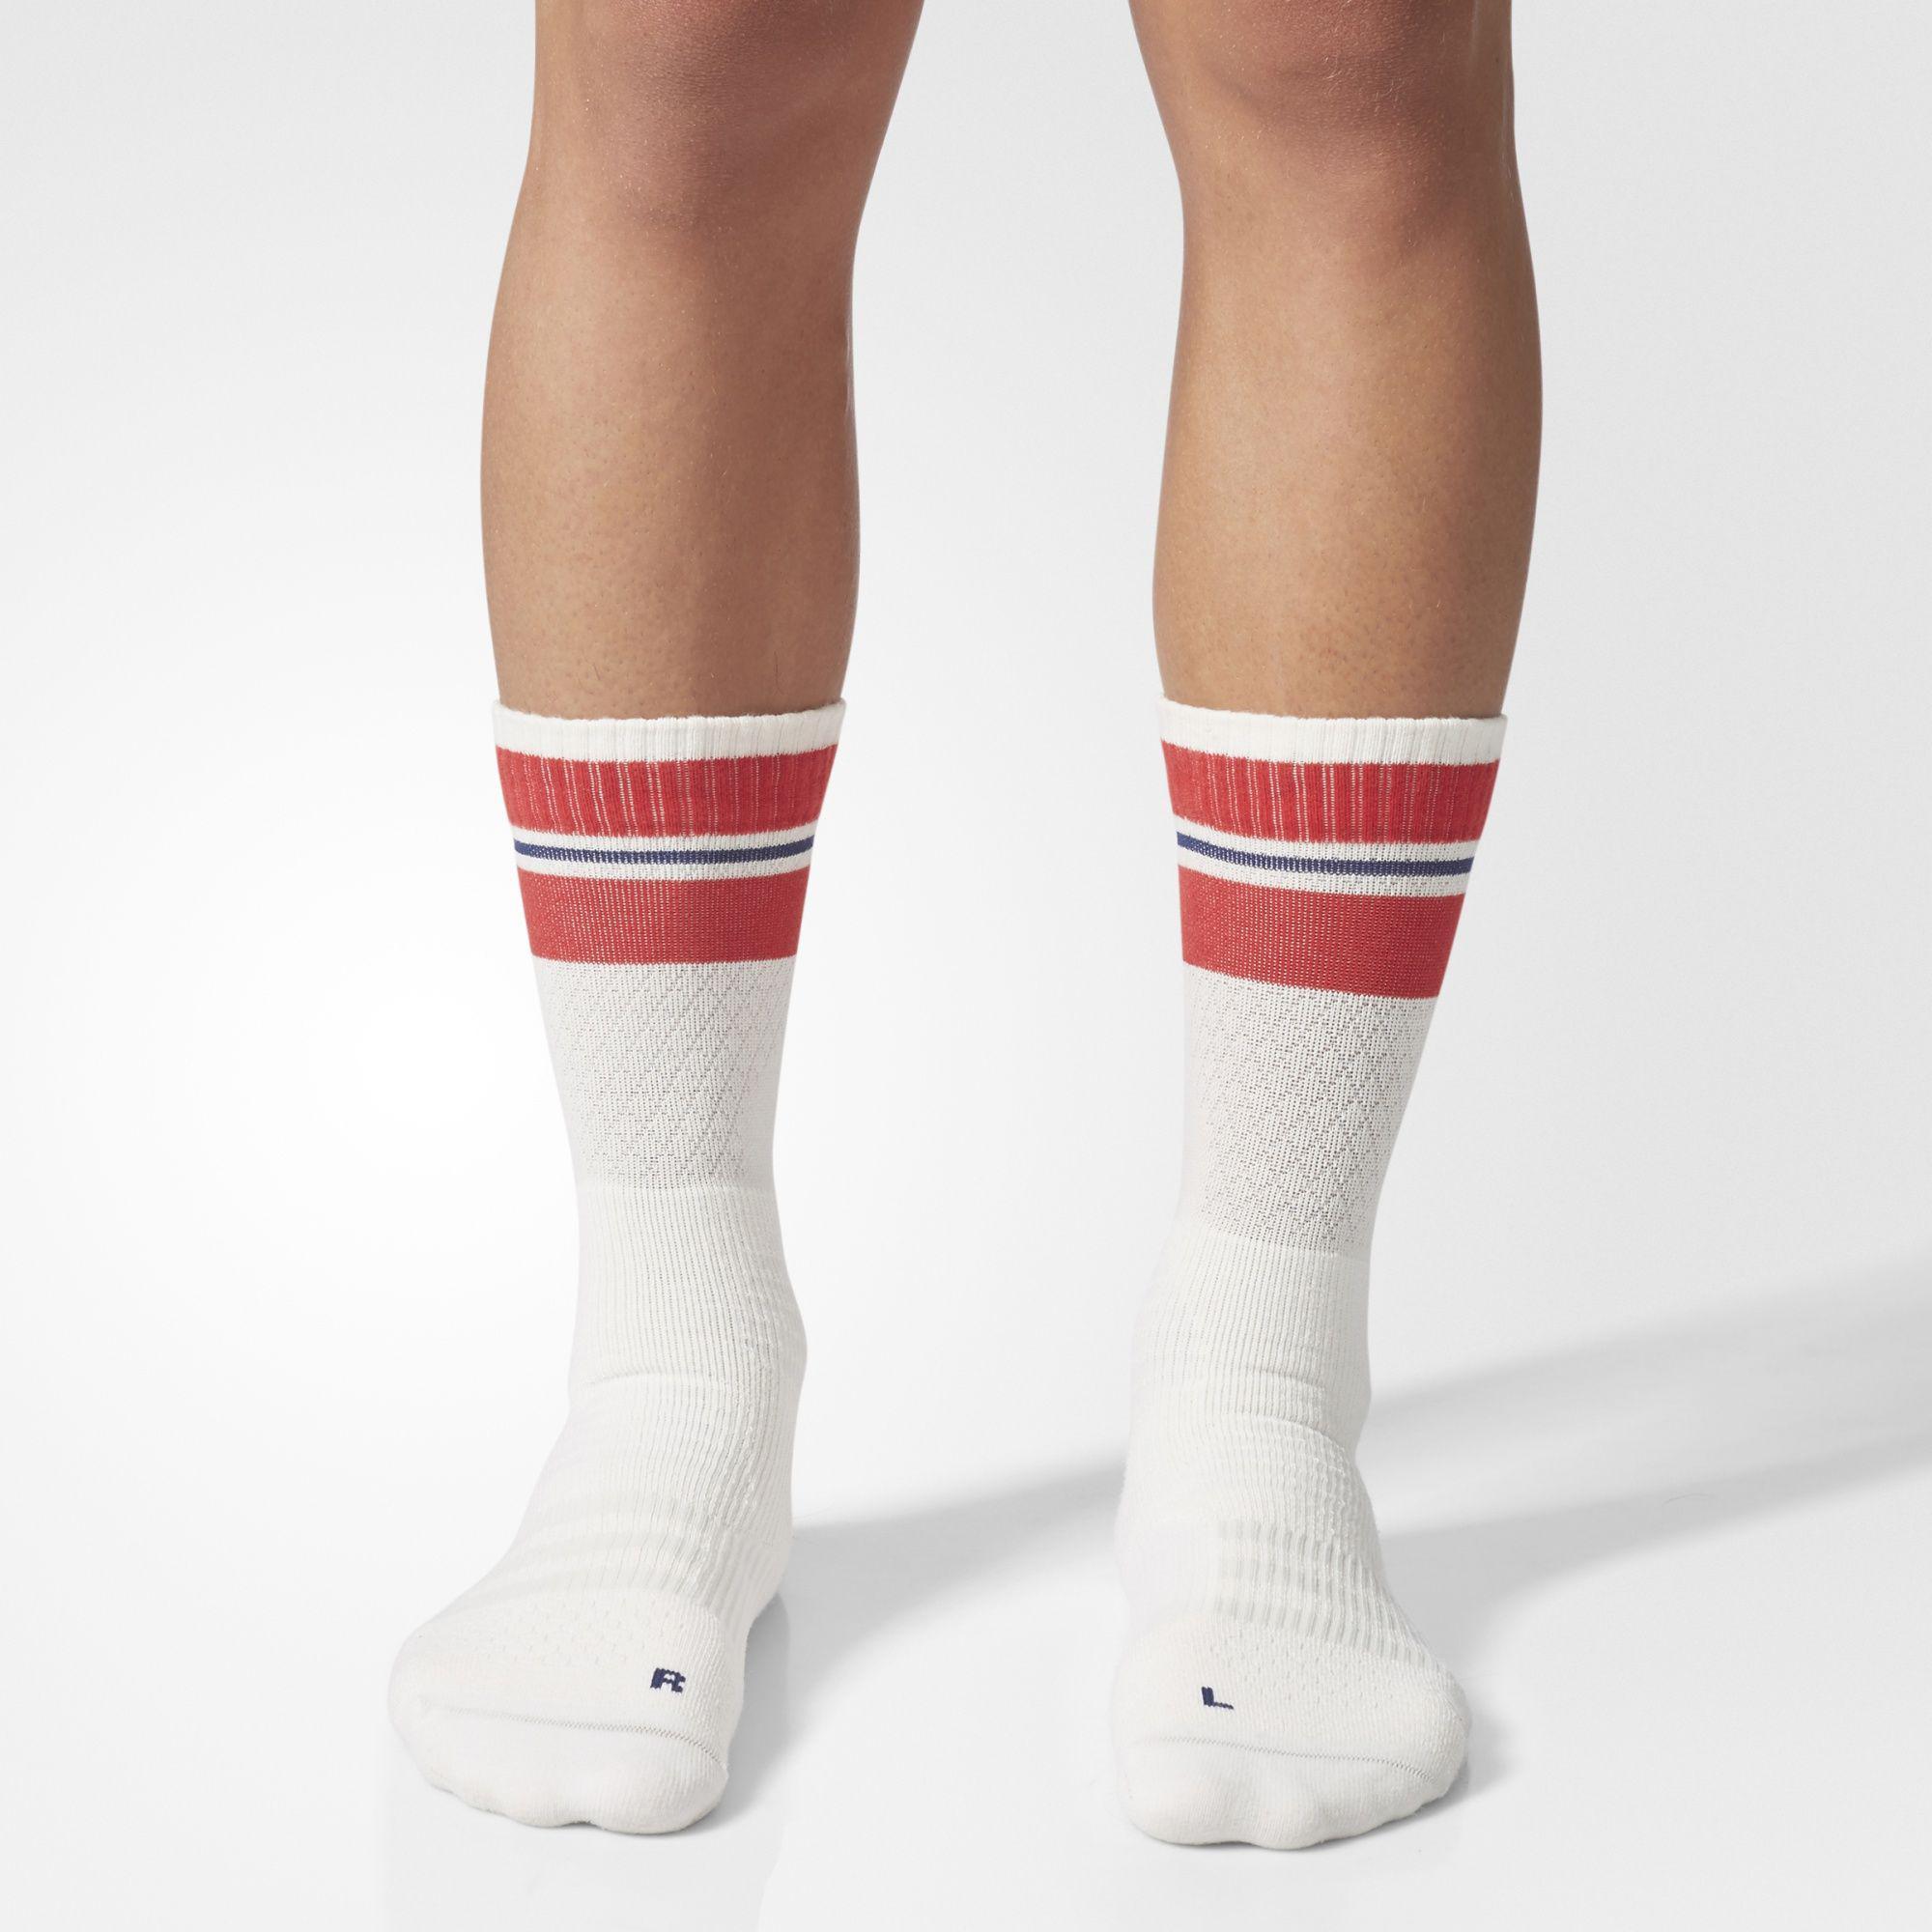 Adidas New York ID Crew Socks (1 Pair) Chalk WhiteScarlet Red